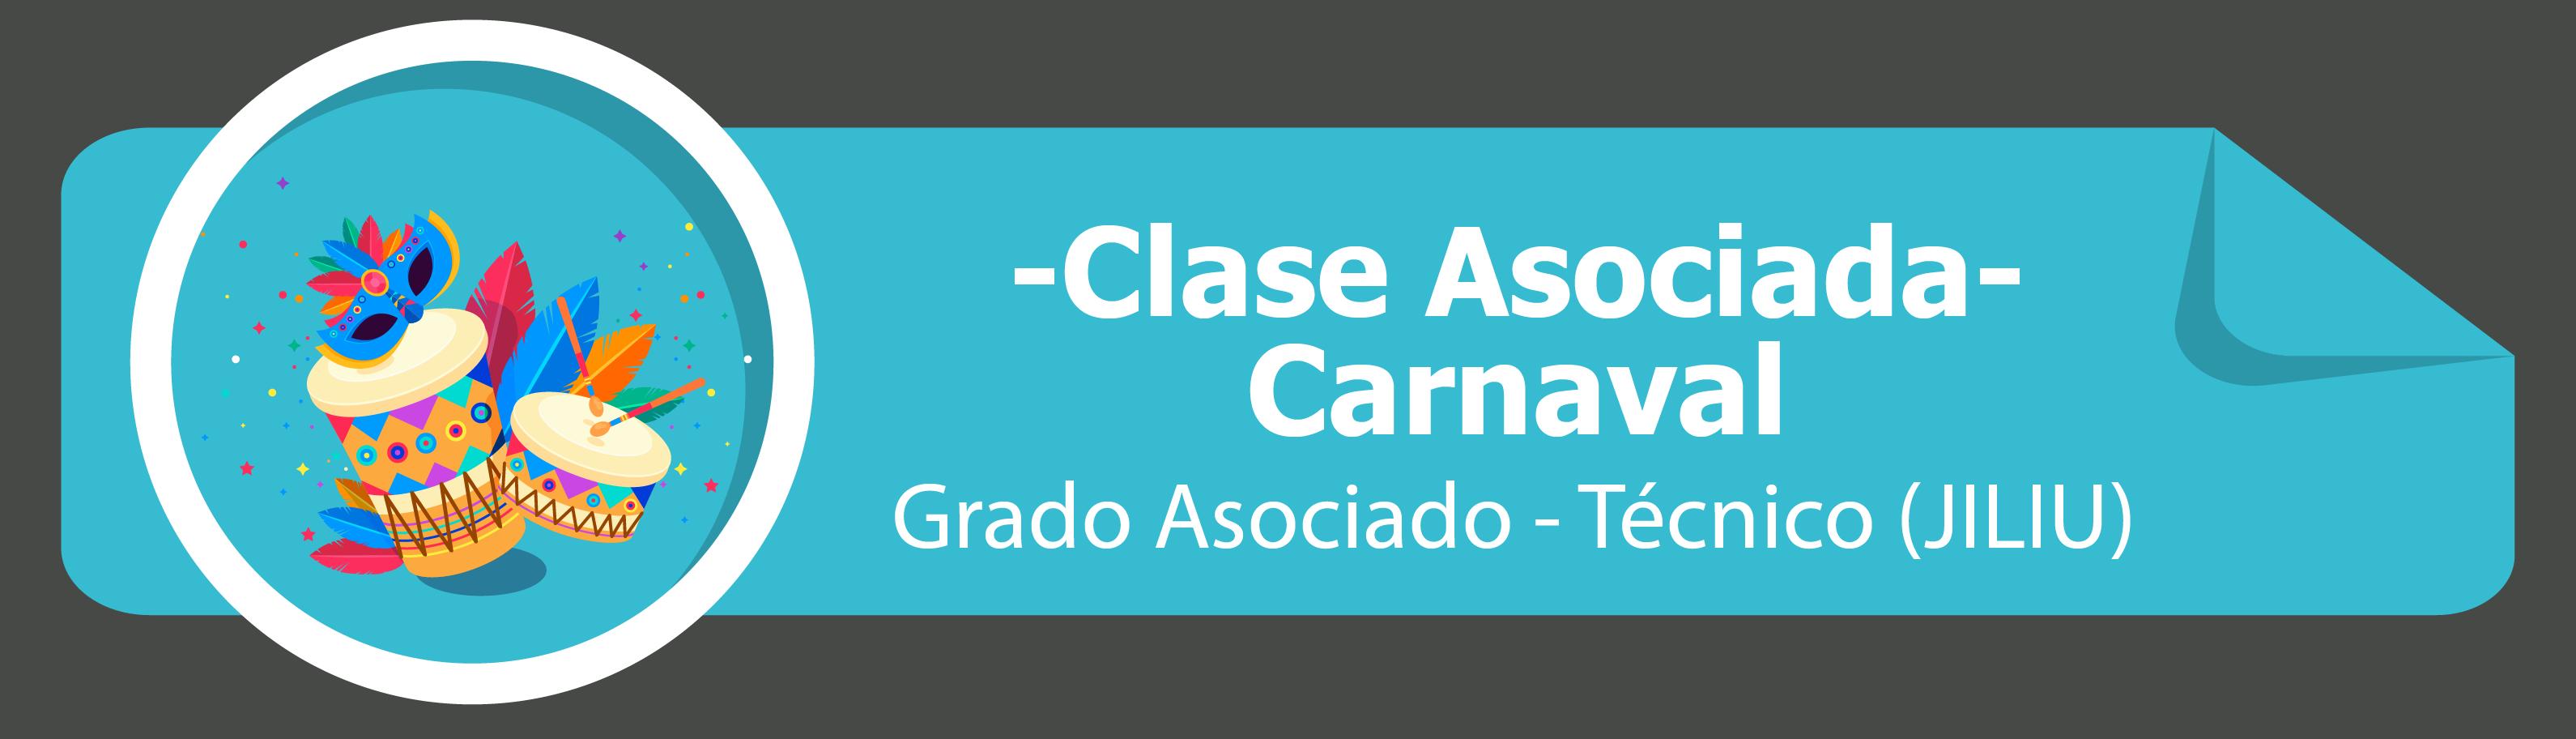 Clase Asociada - Carnaval